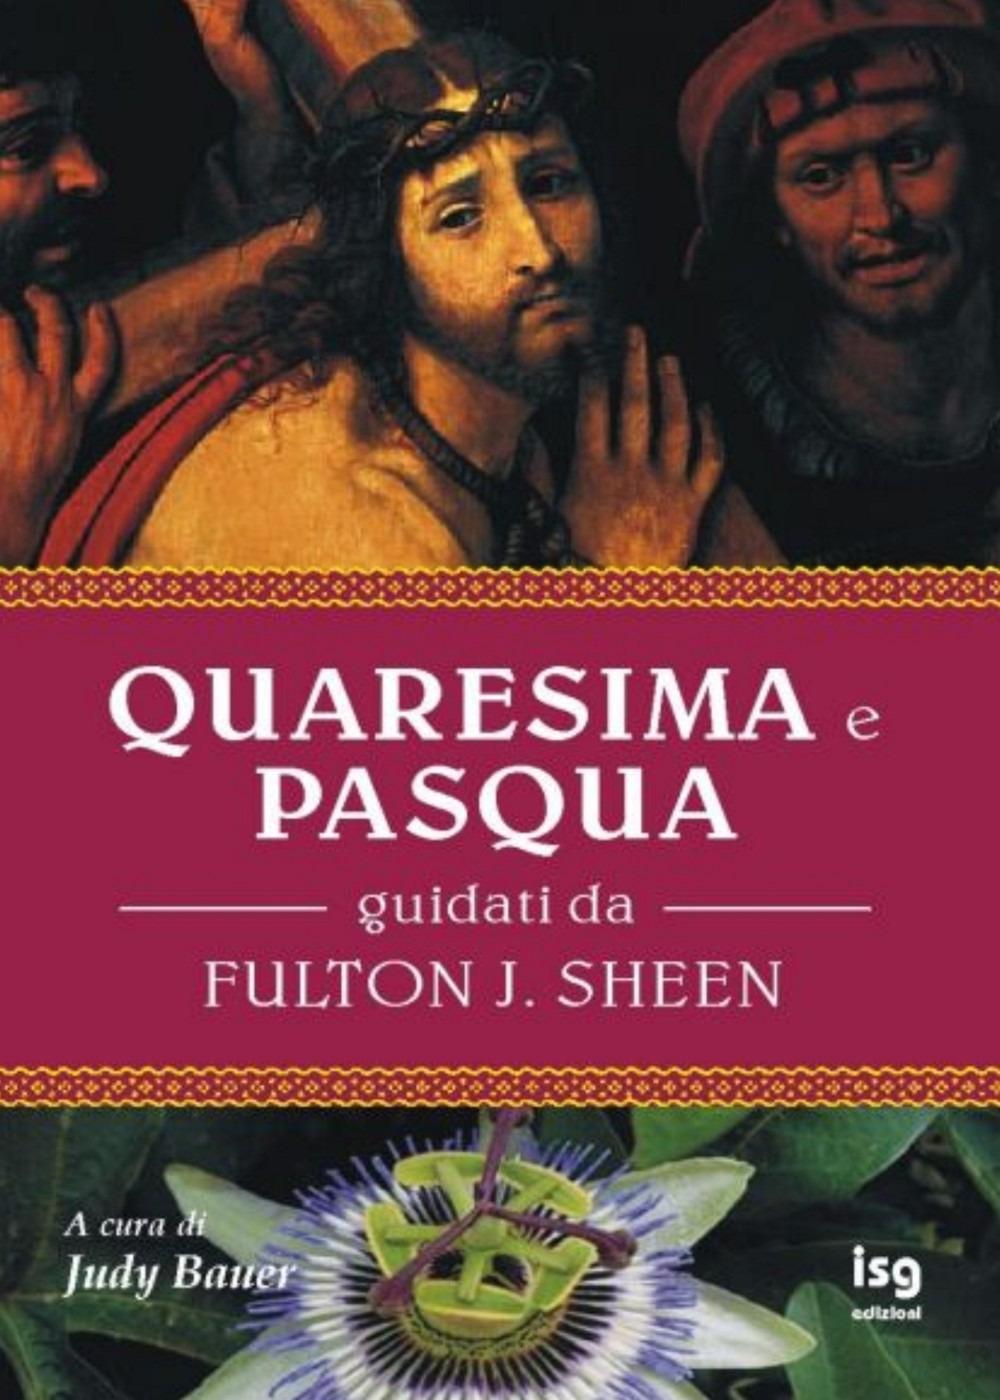 Quaresima e Pasqua. Guidati da Fulton J. Sheen